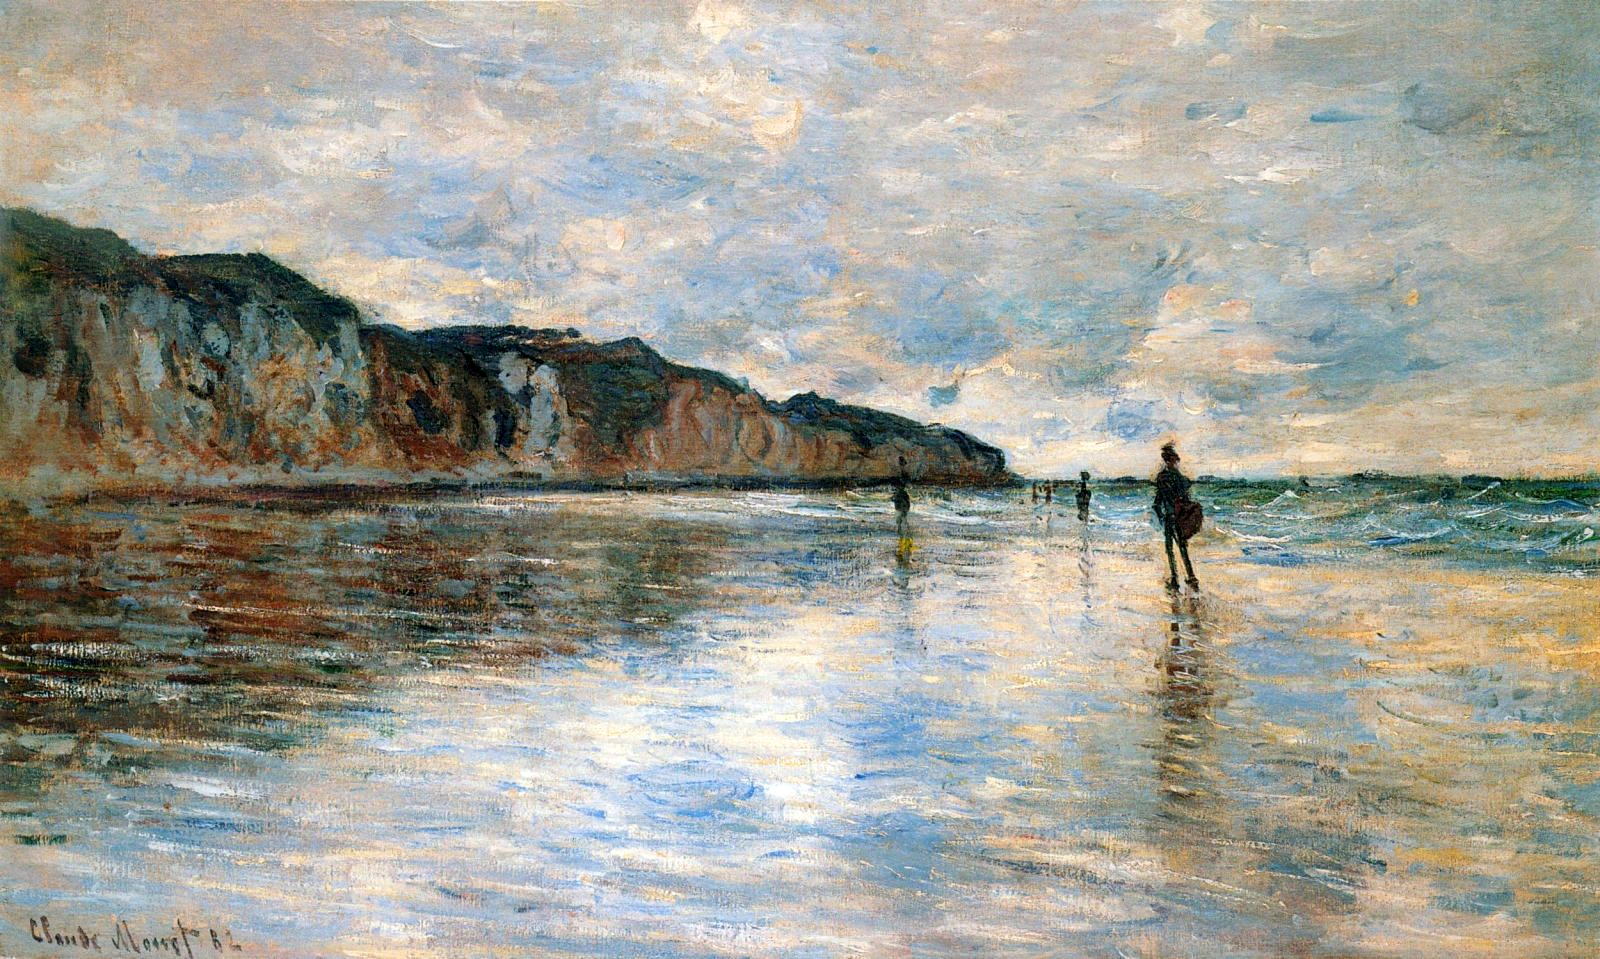 пейзажи - побережье < Пурвилль во время отлива >:: Клод Моне, описание картины - Claude Monet фото